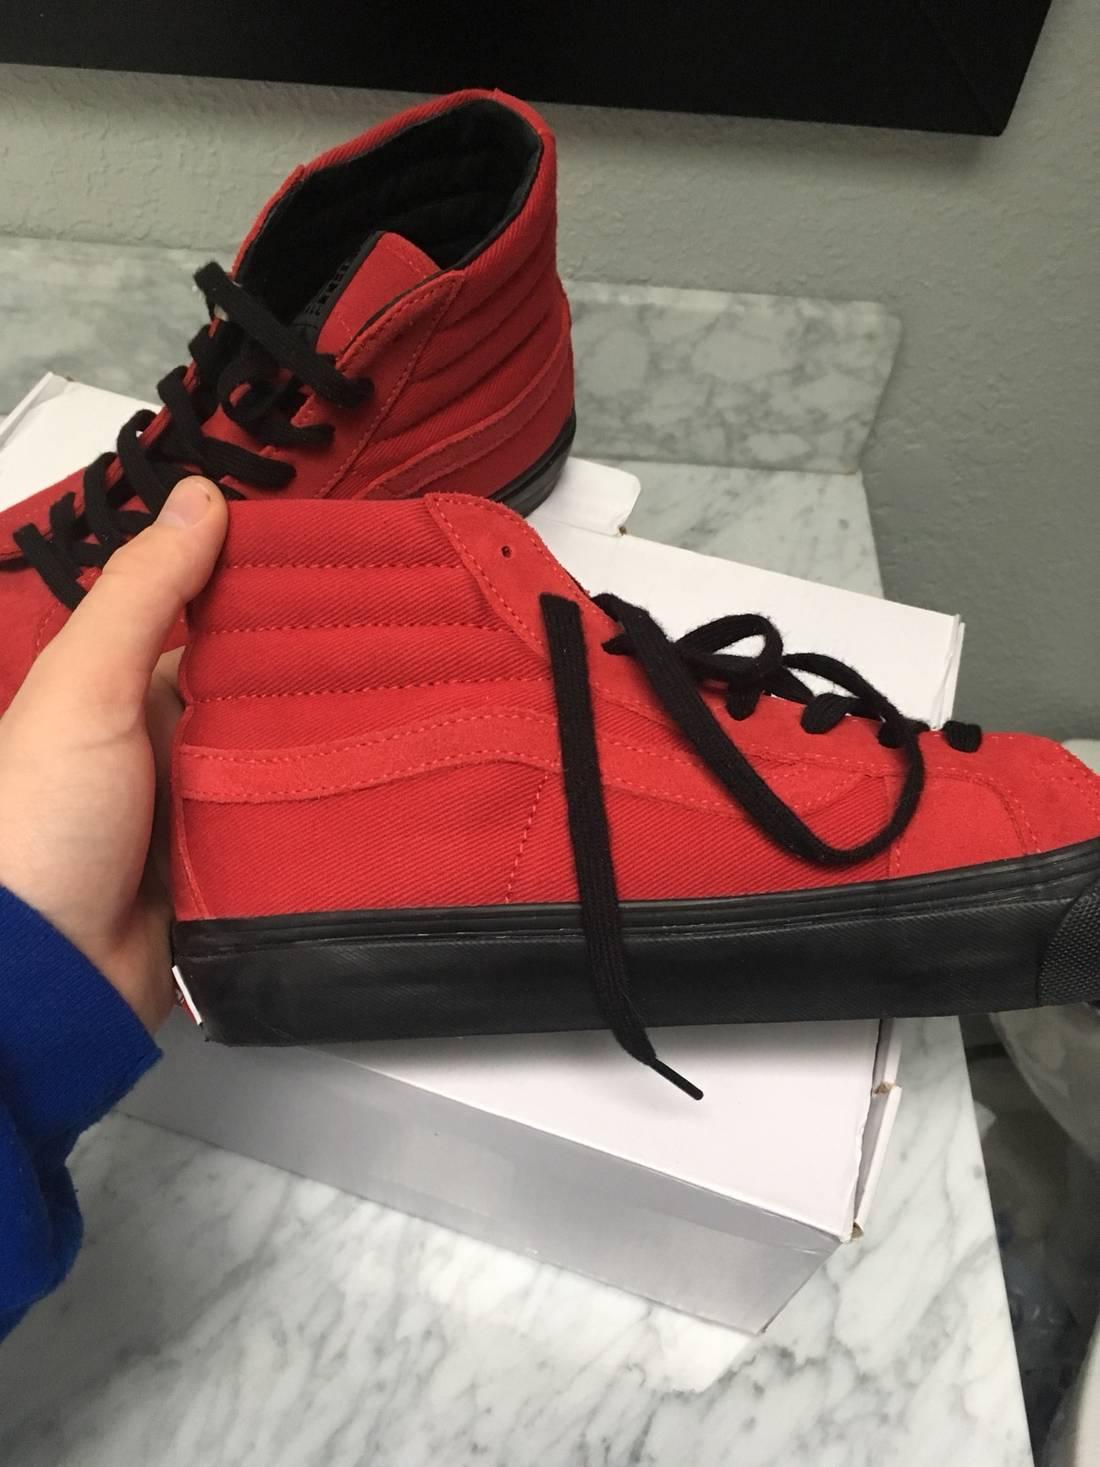 Red Alyx Edition OG Style 138 LX High-Top Sneakers Vans jKCYs3u1M